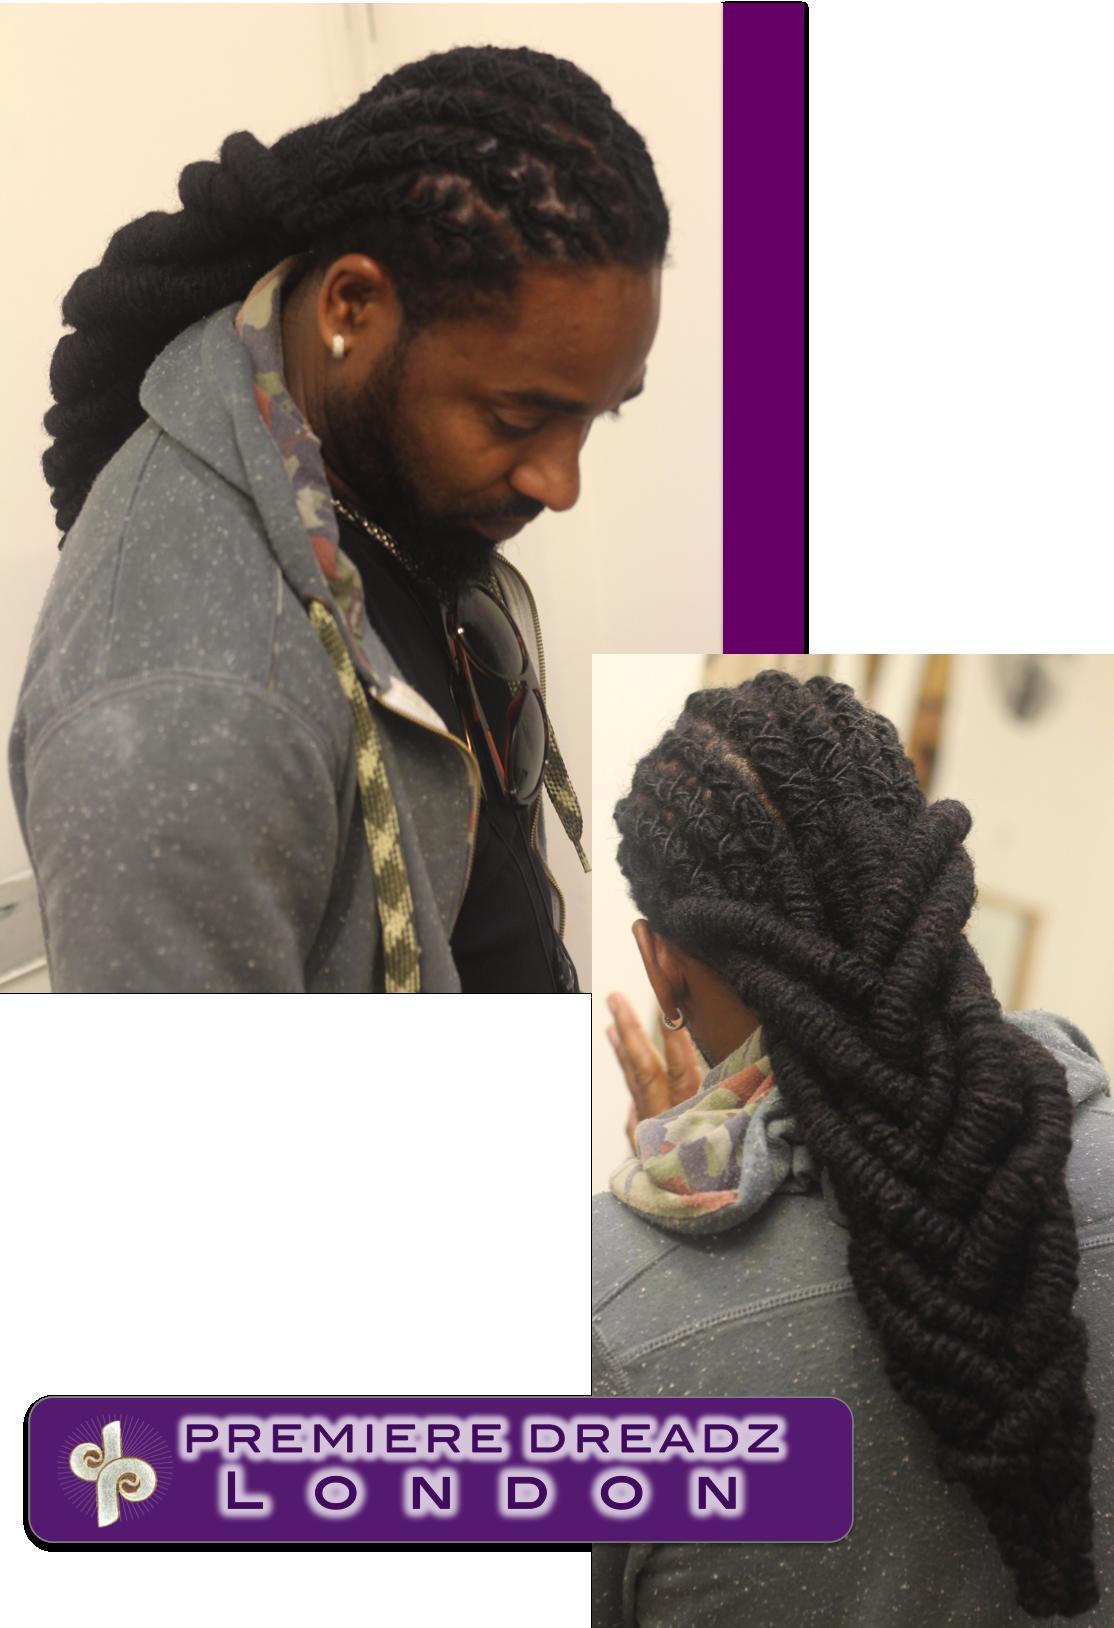 loc styles for men | beauty in locs(dreads) | pinterest | locs